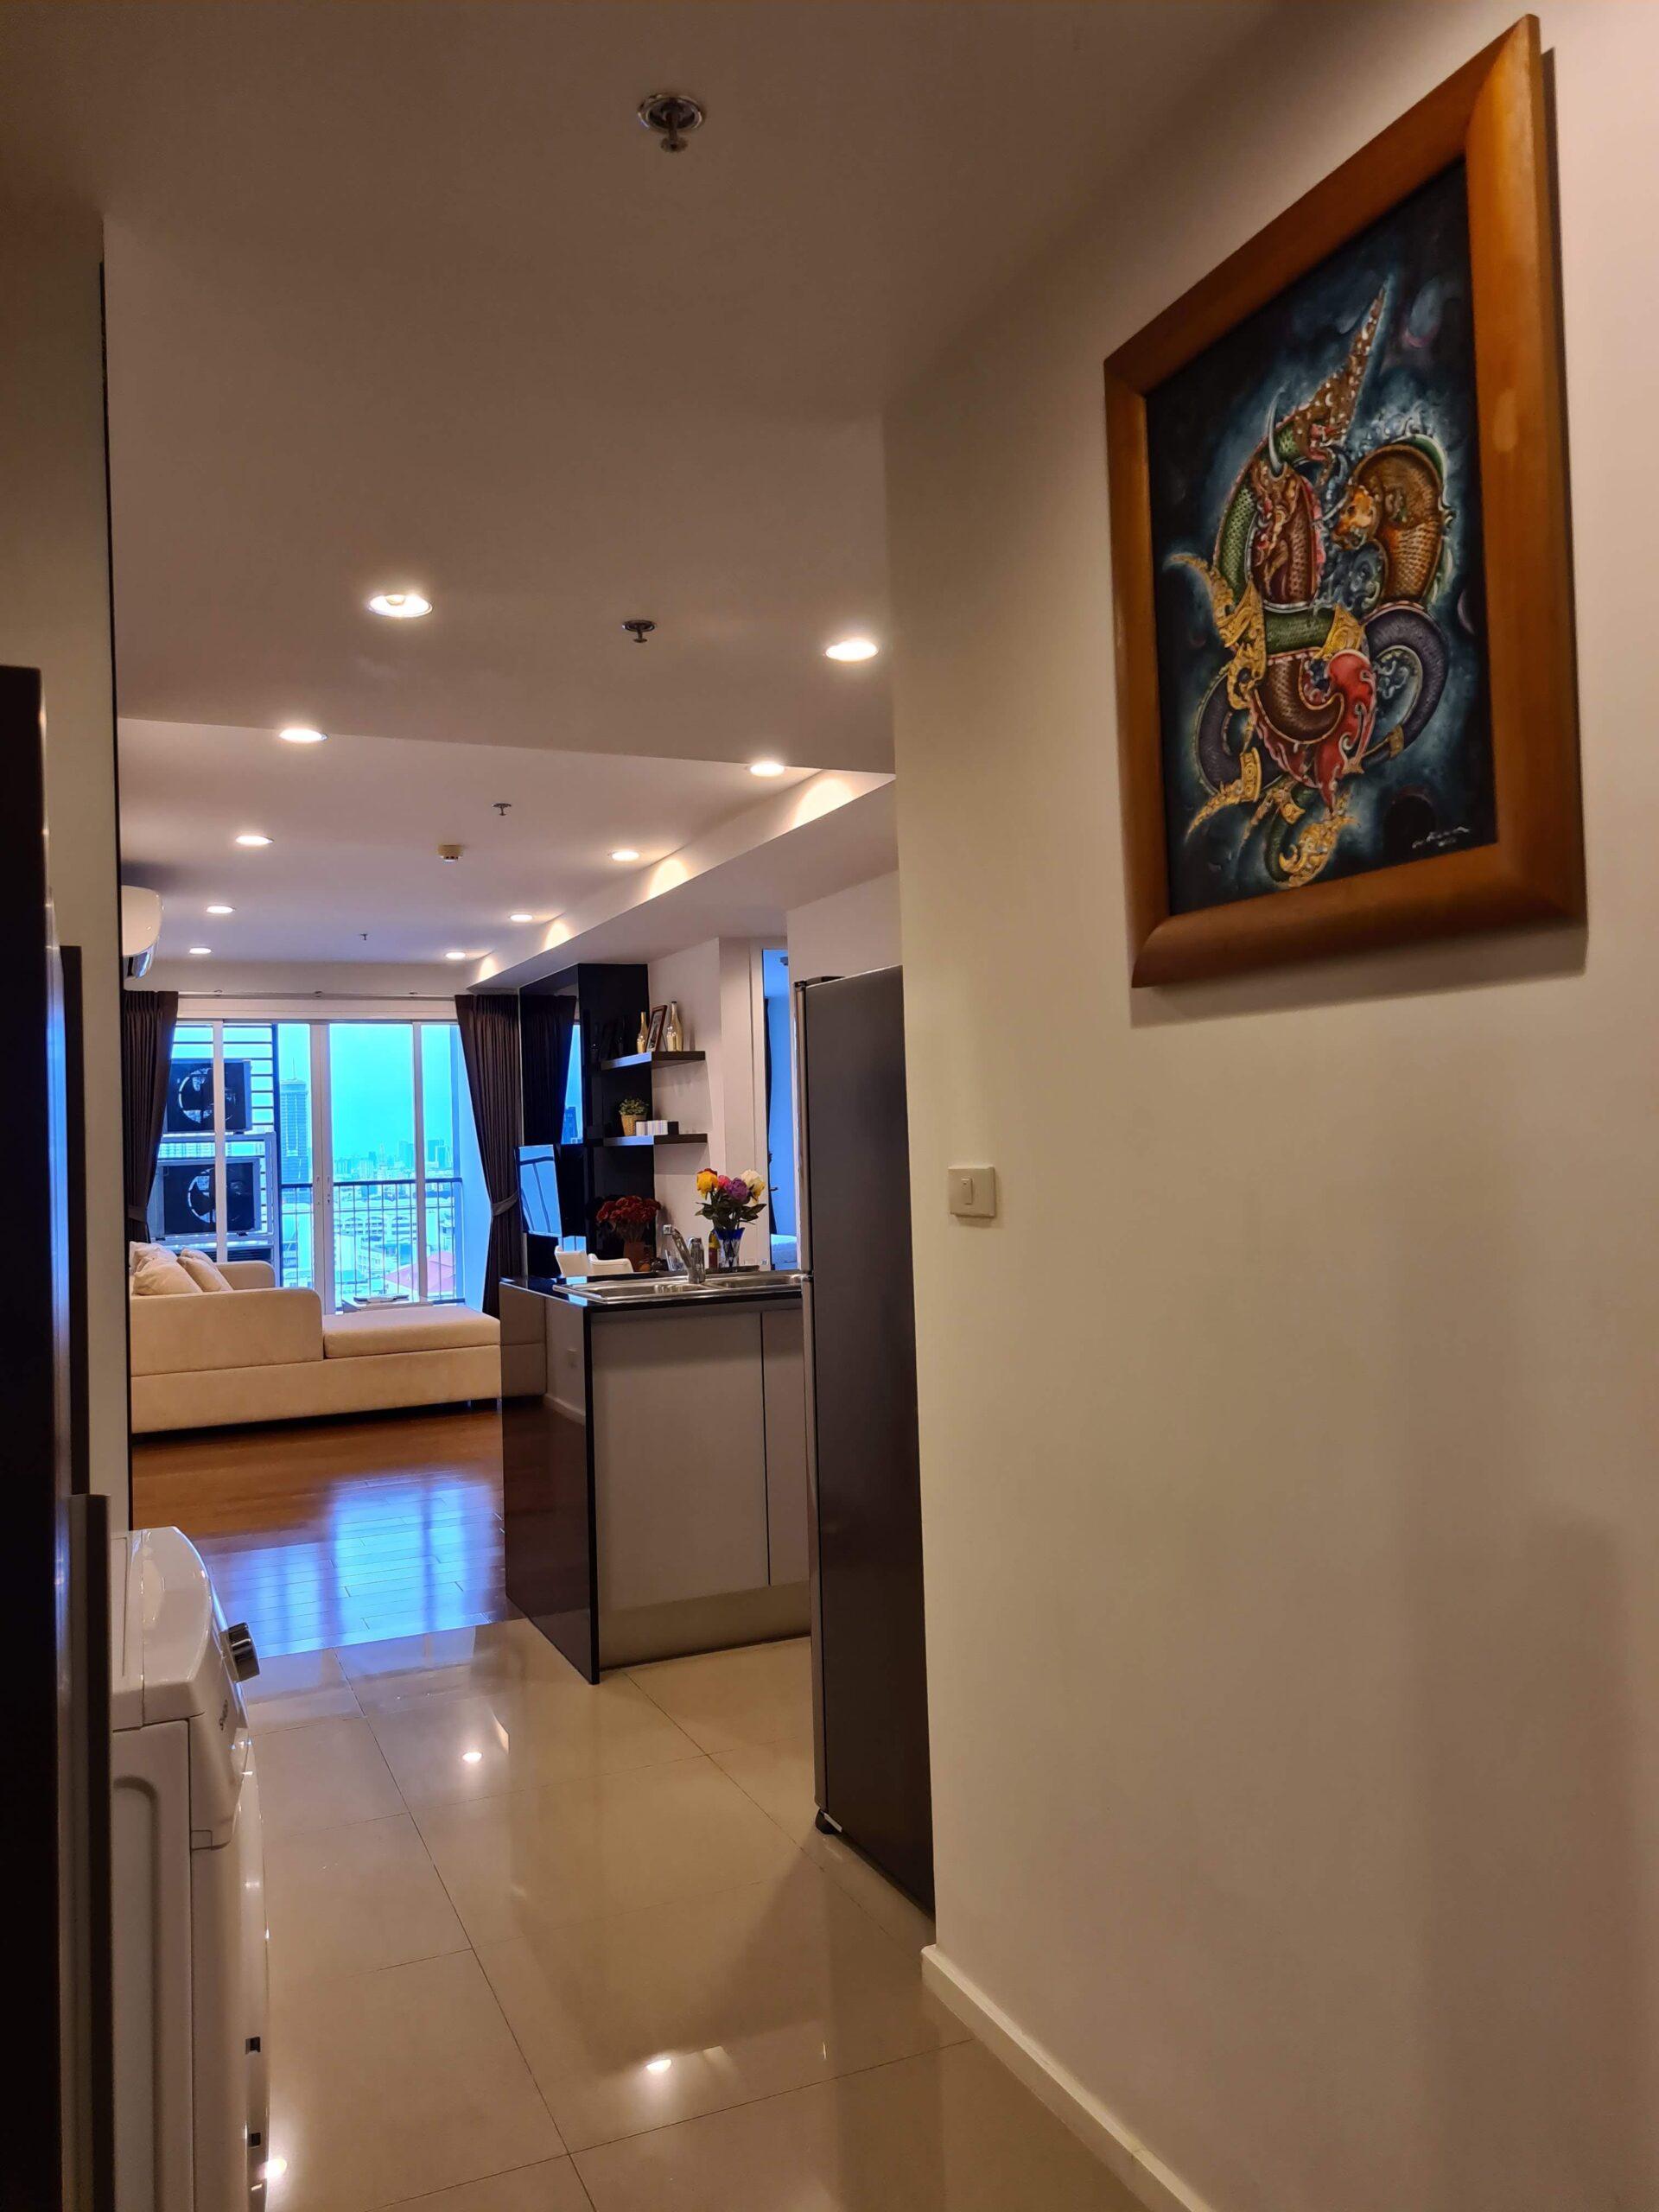 Bangkok Property Condo Apartment Real Estate For Rent in Sukhumvit Nice & Bright in Nana